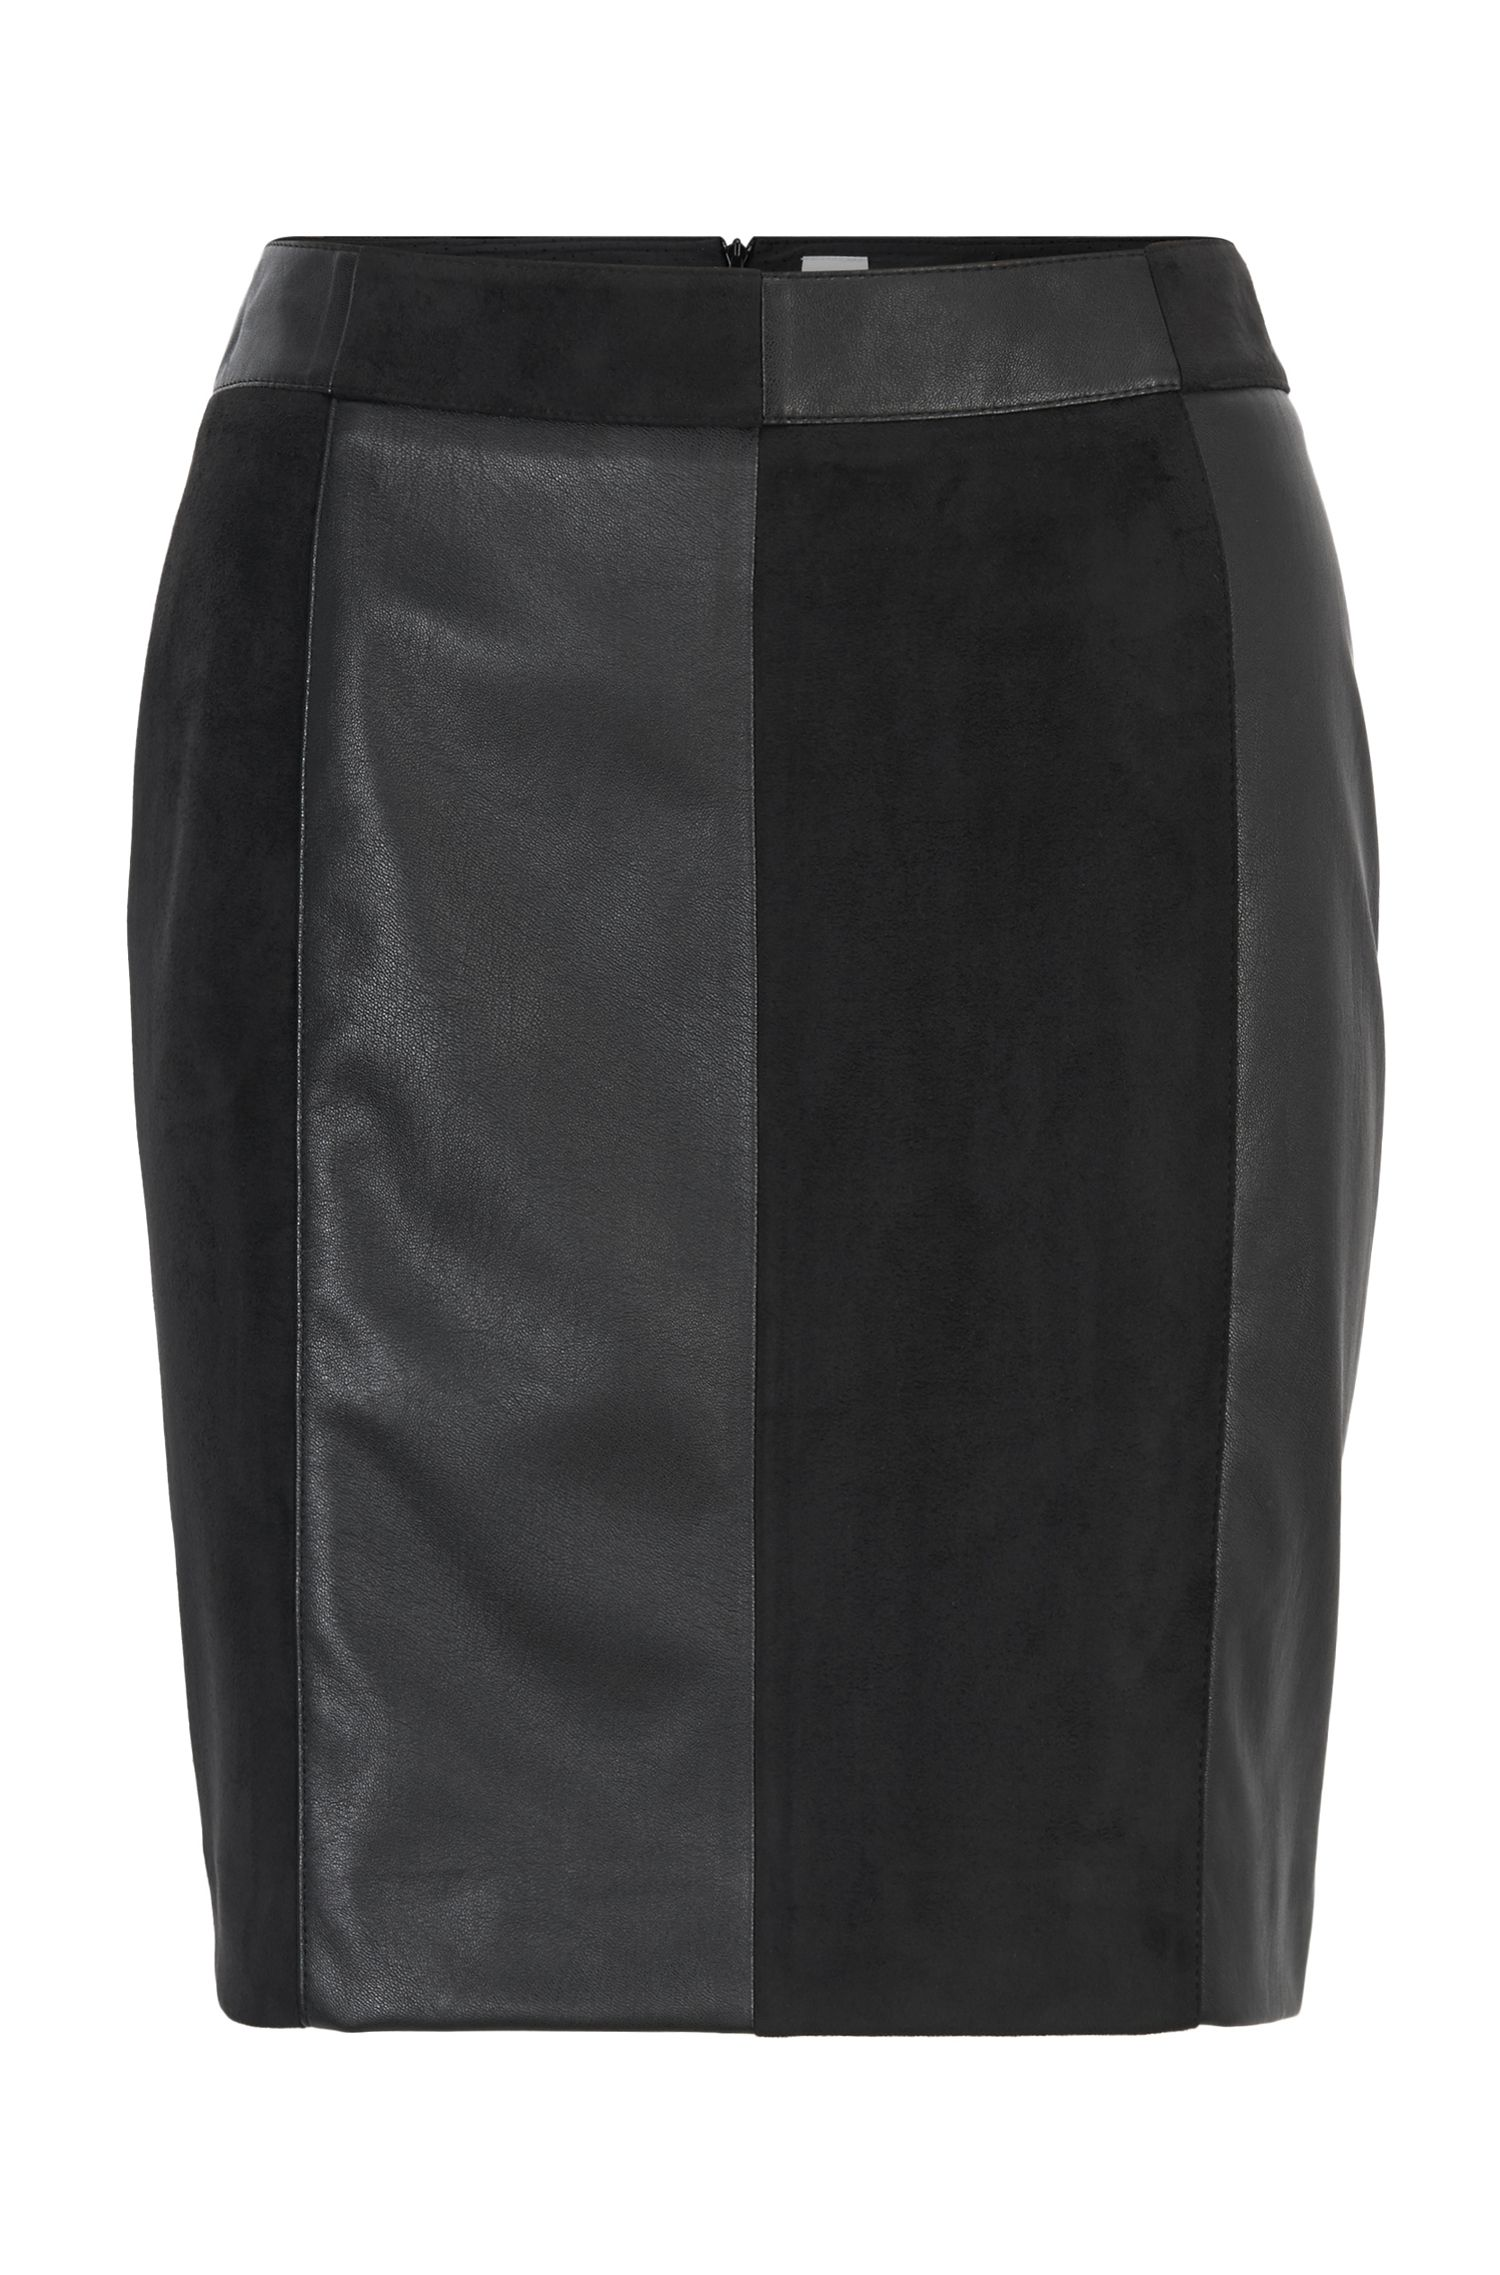 Hybrid mini skirt in friendly leather